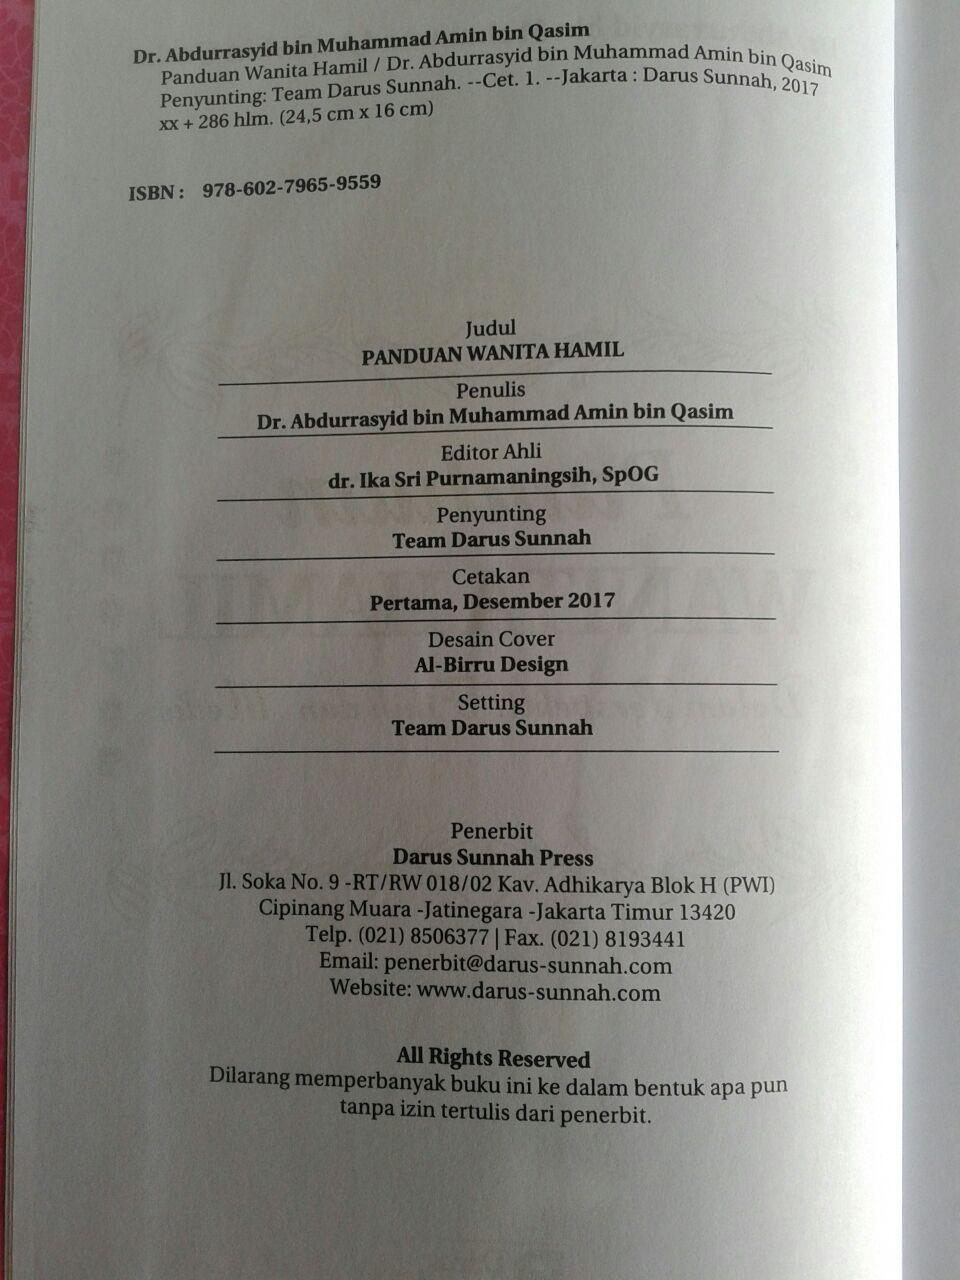 Buku Panduan Wanita Hamil Dalam Perspektif Fikih Dan Medis isi 2